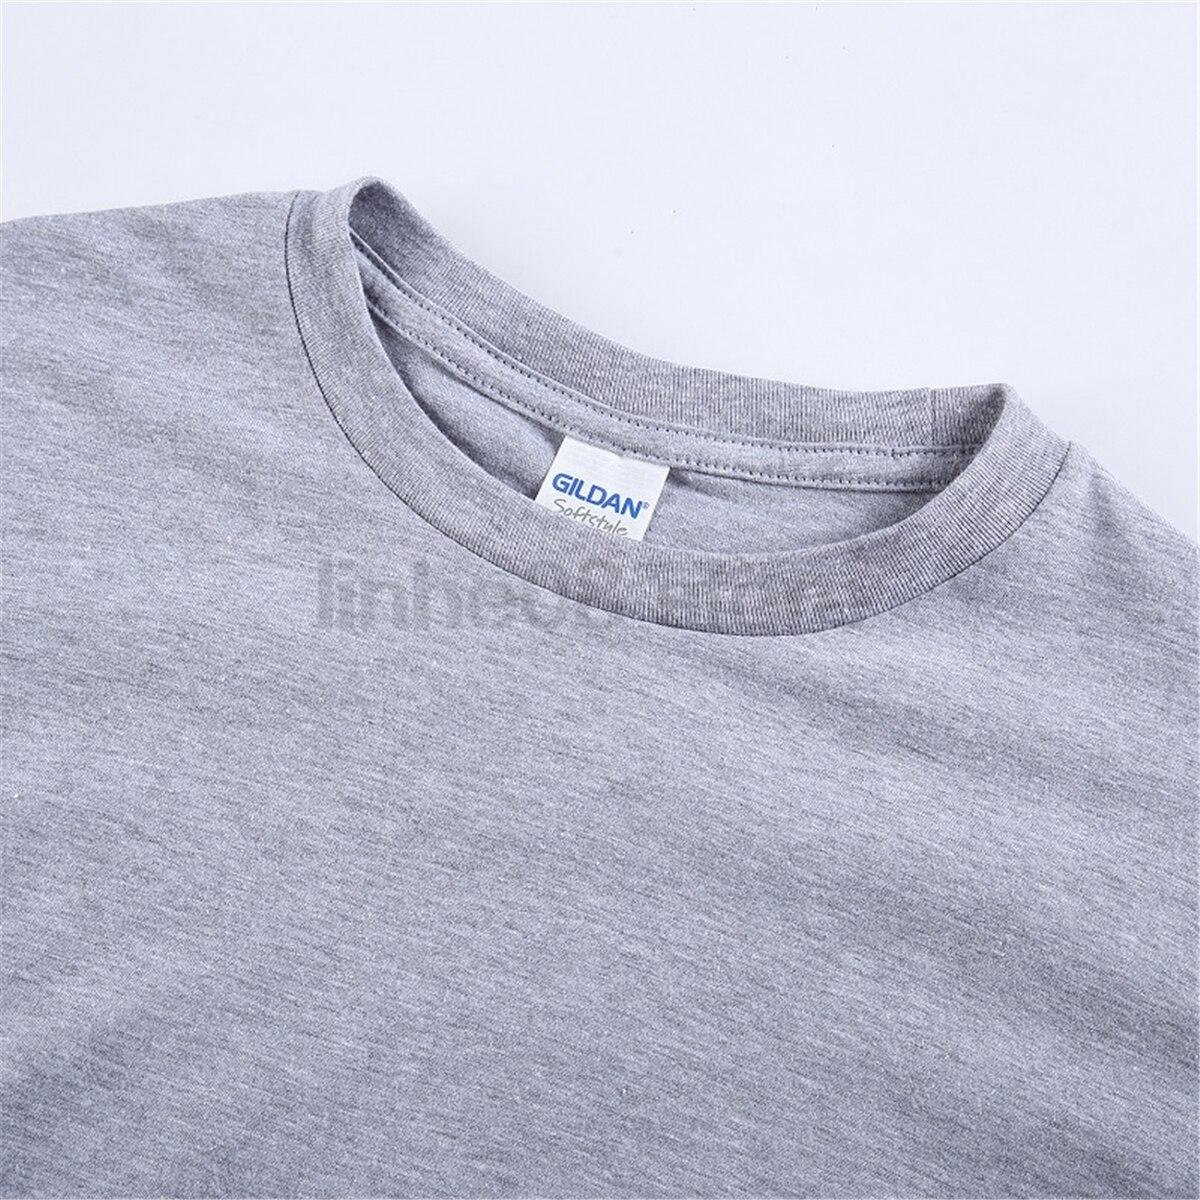 GILDAN AMERICA YEAH T SHIRT PATRIOT T-SHIRT Womens T-shirt